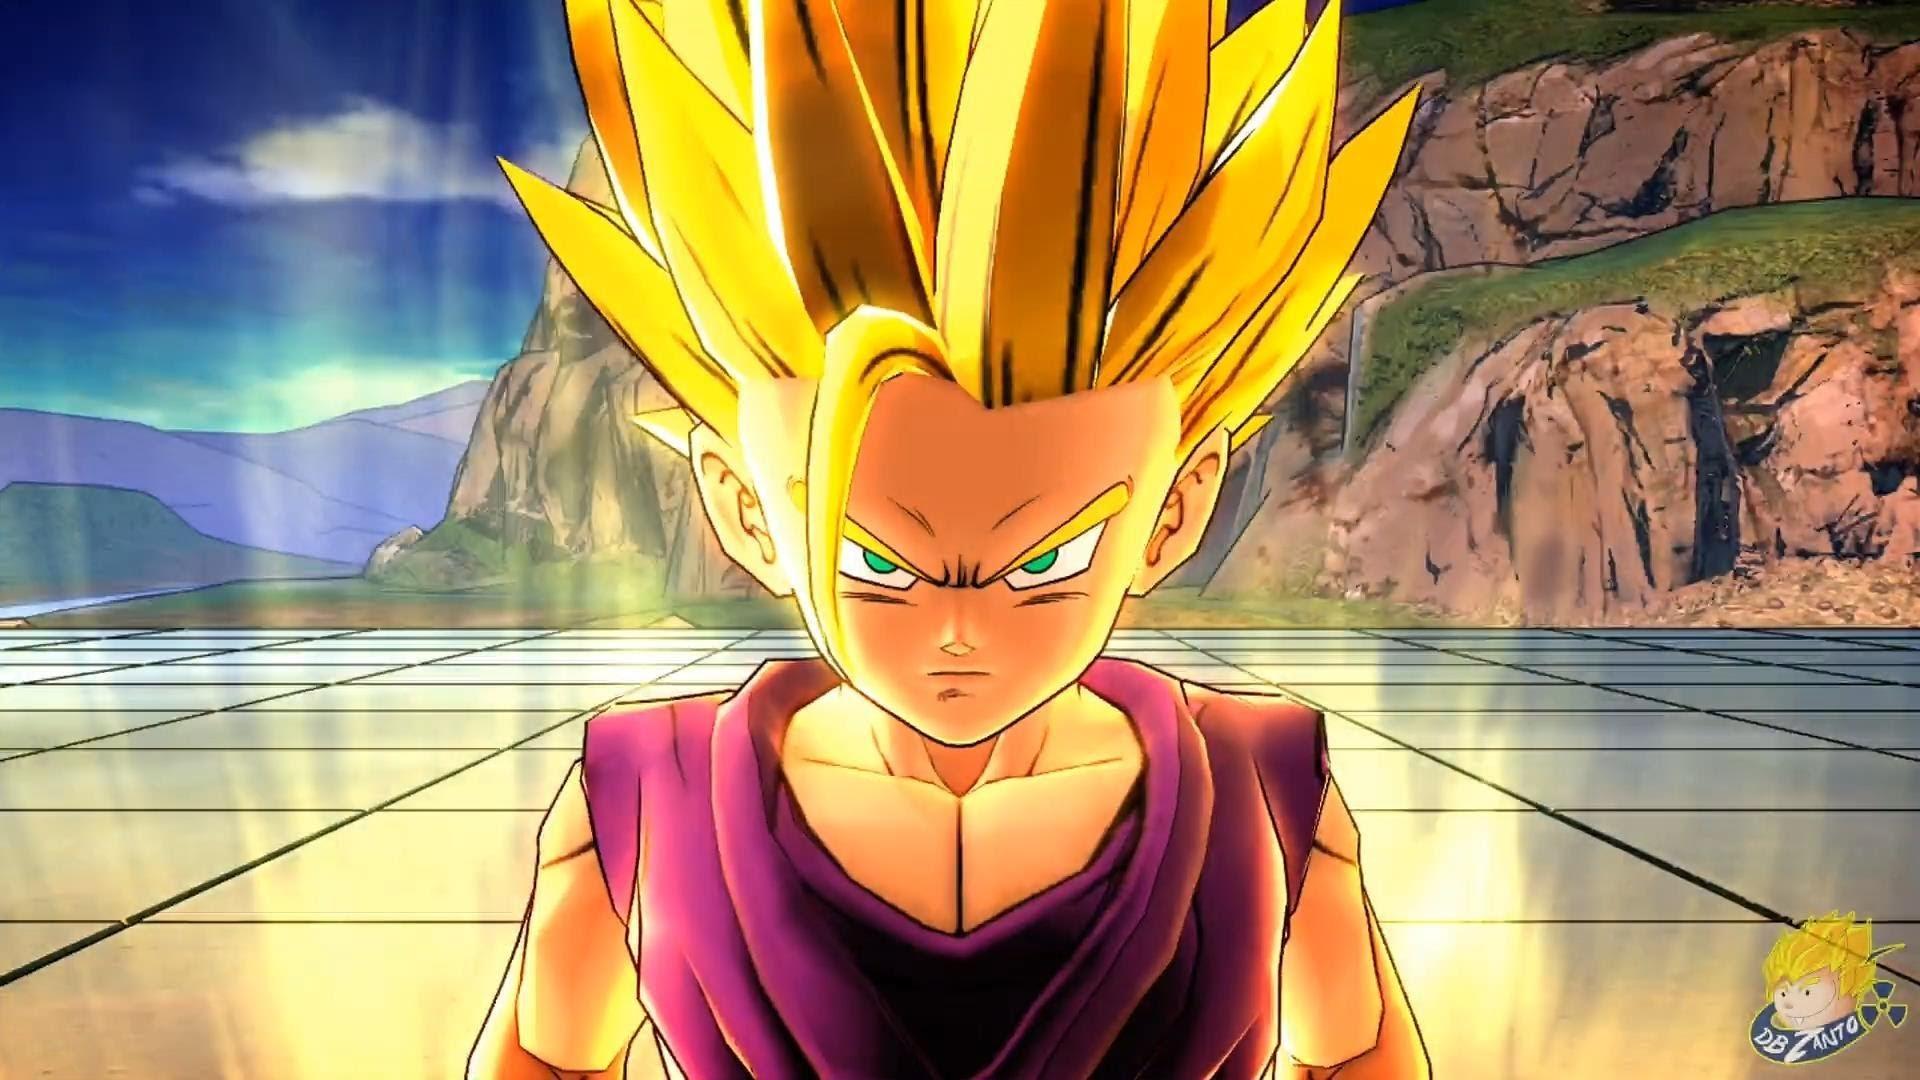 Dragon Ball Z: Battle of Z – | Teen Gohan Transforms Into A Super Saiyan 2  |【FULL HD】 – YouTube